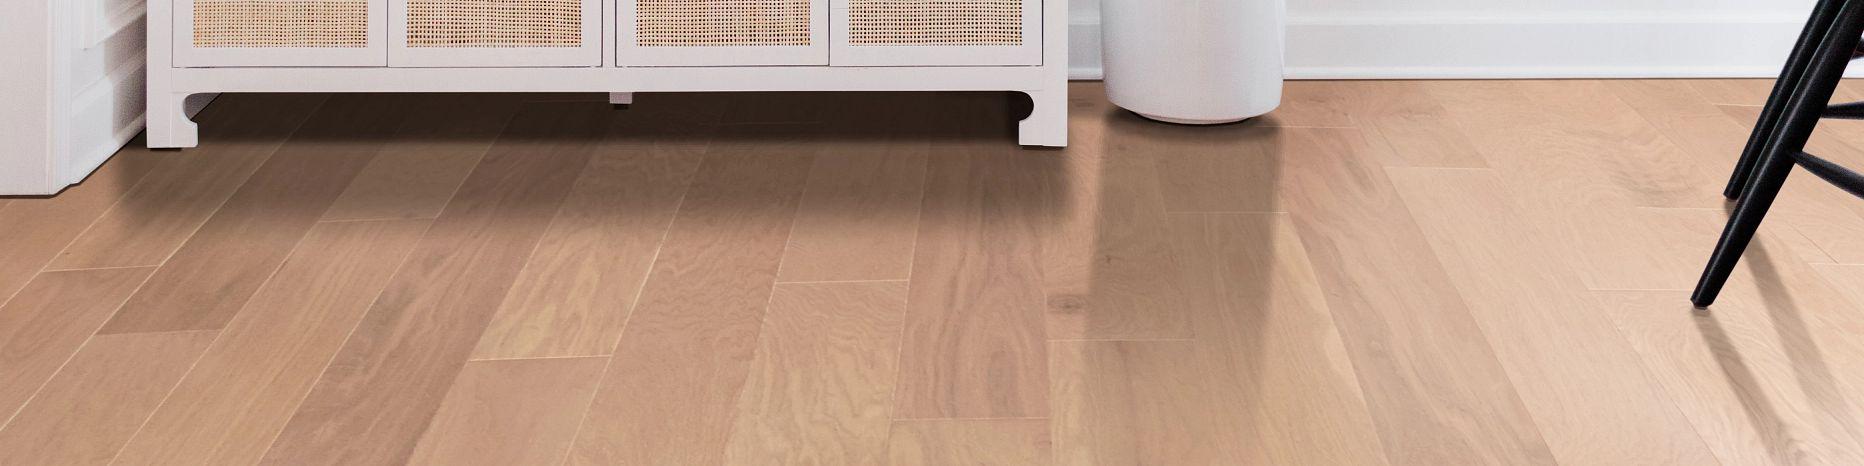 Hardwood-Duras-PillarOak-HW705-01093-Crystal-Furniture-2020-SWS